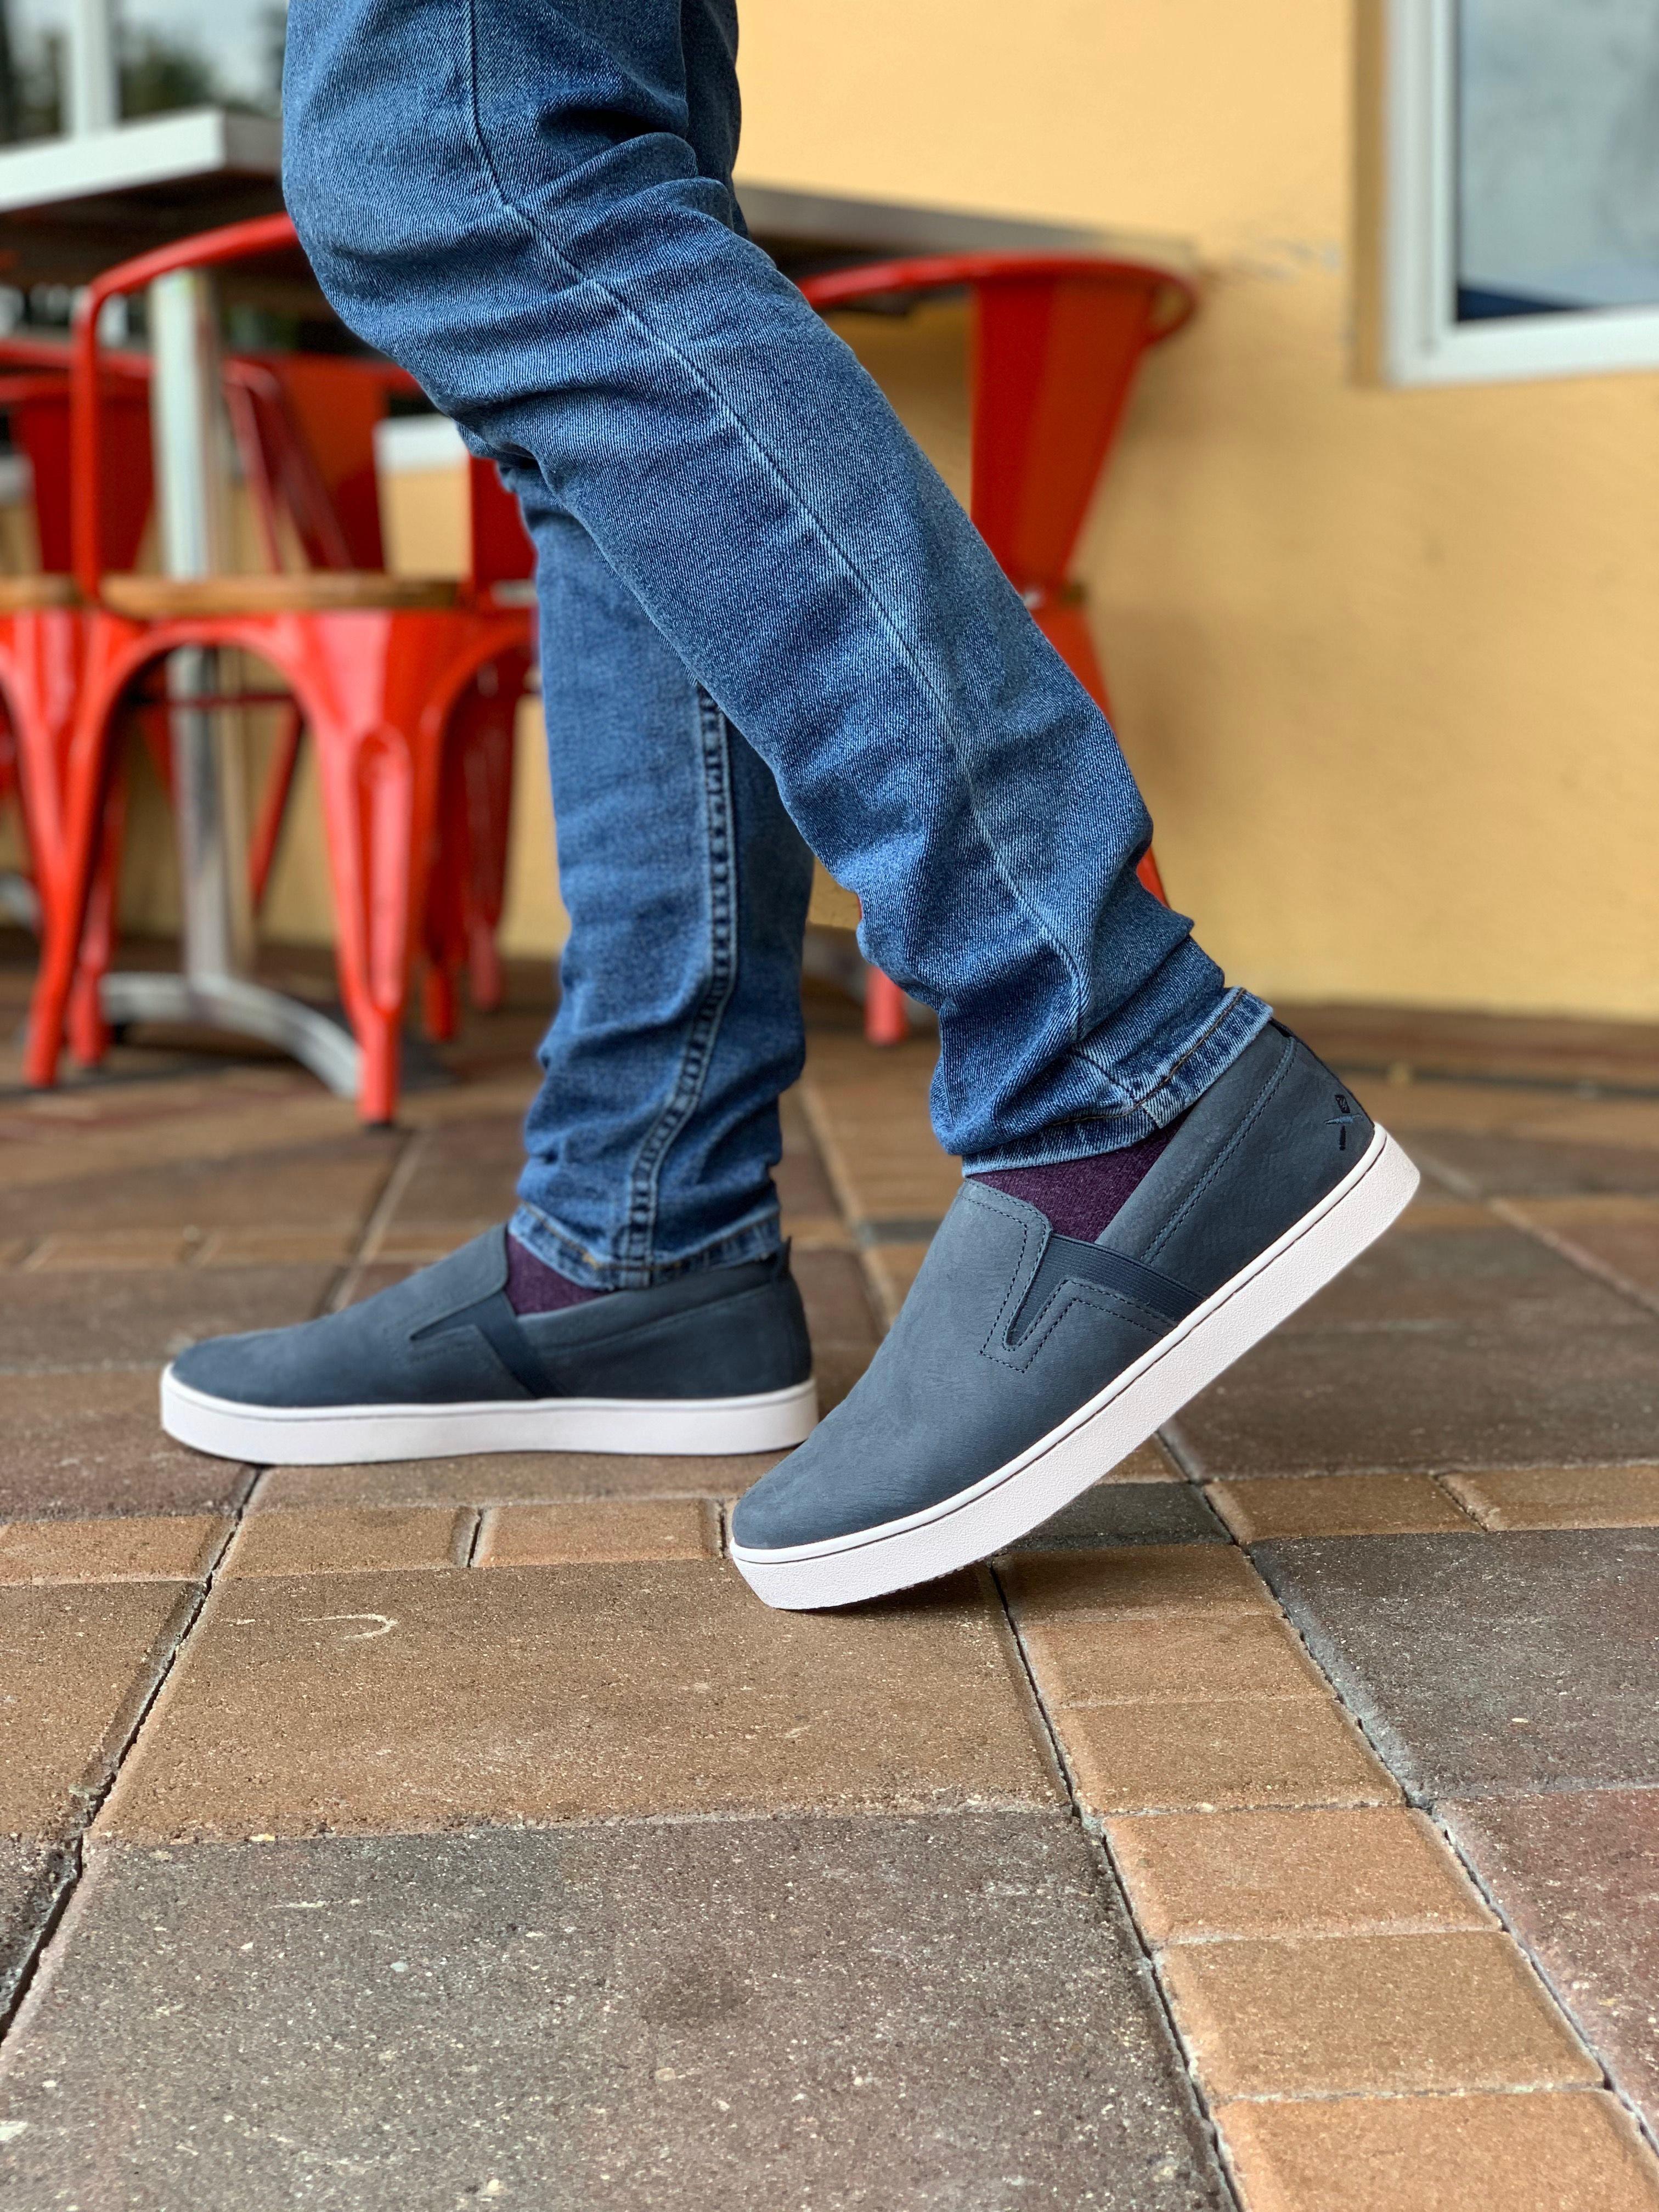 Mozo Floyd Blue Men S Work Shoes Vans Classic Slip On Sneaker Blue Man